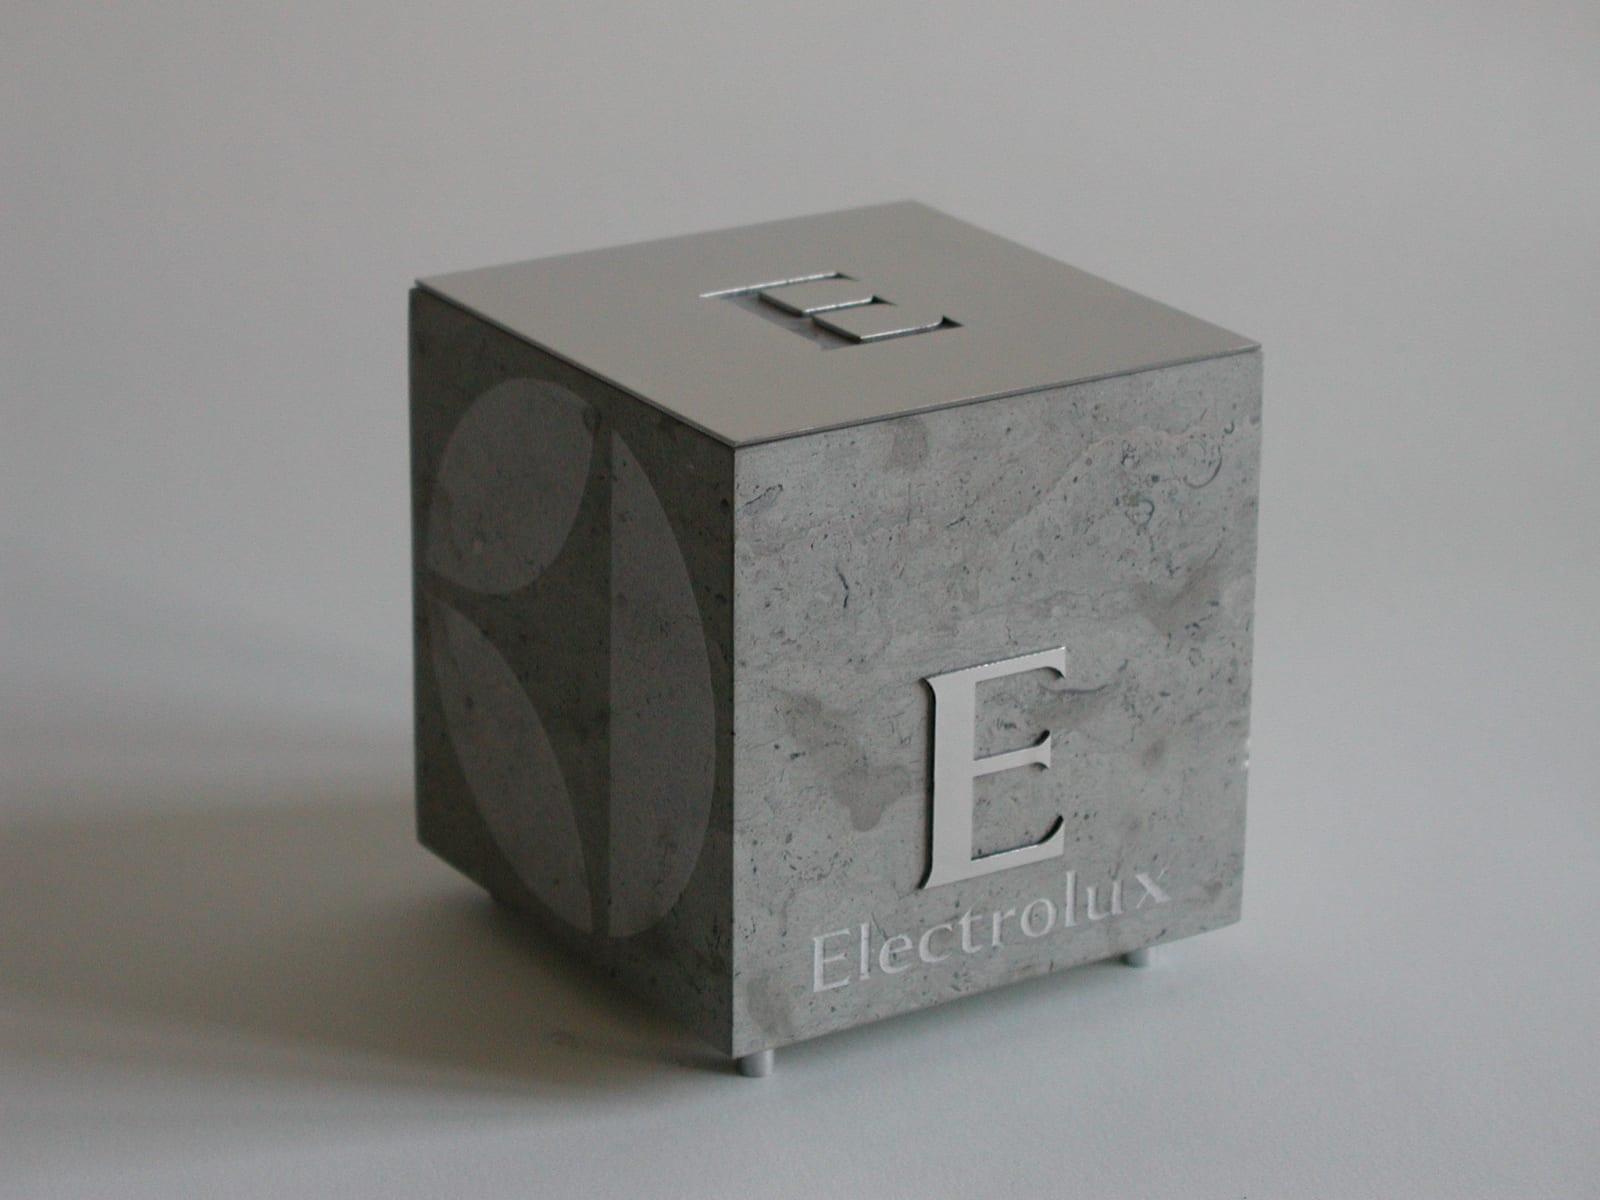 ELEKTROLUX 2001 paekivi, roostevaba teras <br/> For ELEKTROLUX 2001 limestone, stainless steel